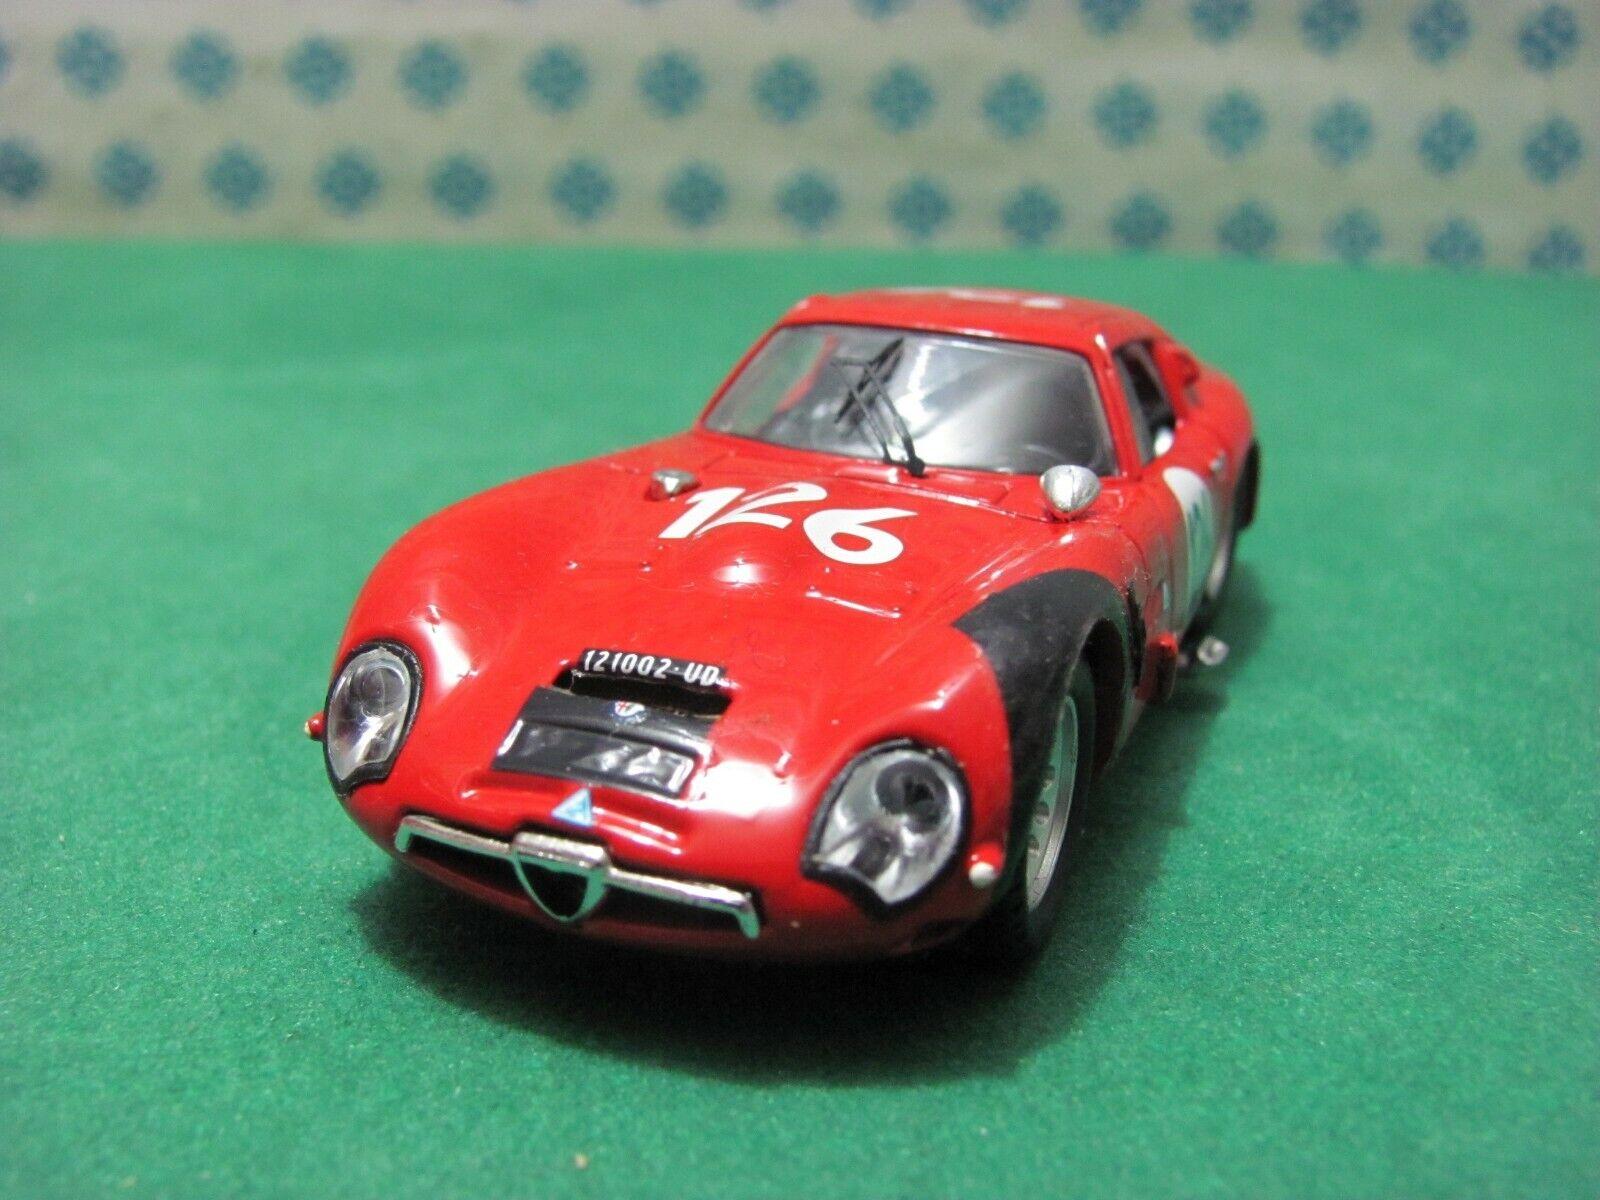 clásico atemporal ALFA ROMEO Giulia TZ 2  Zagato coupè 1600 1600 1600  T. Florio 1966   - 1 43 Best 9105  salida